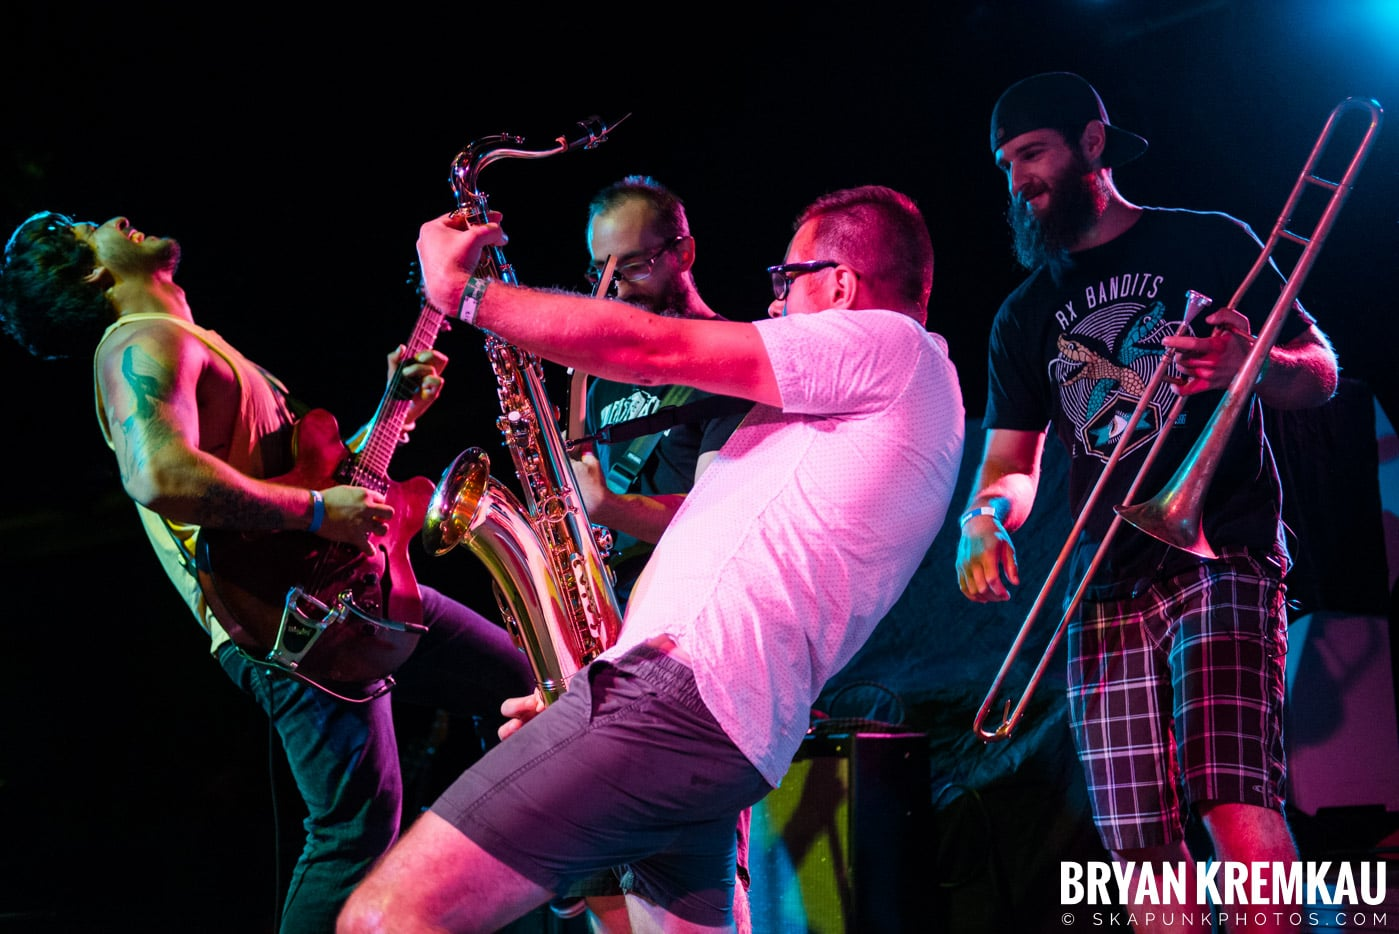 Backyard Superheroes @ Starland Ballroom, Sayreville, NJ - 7.29.17 (2)